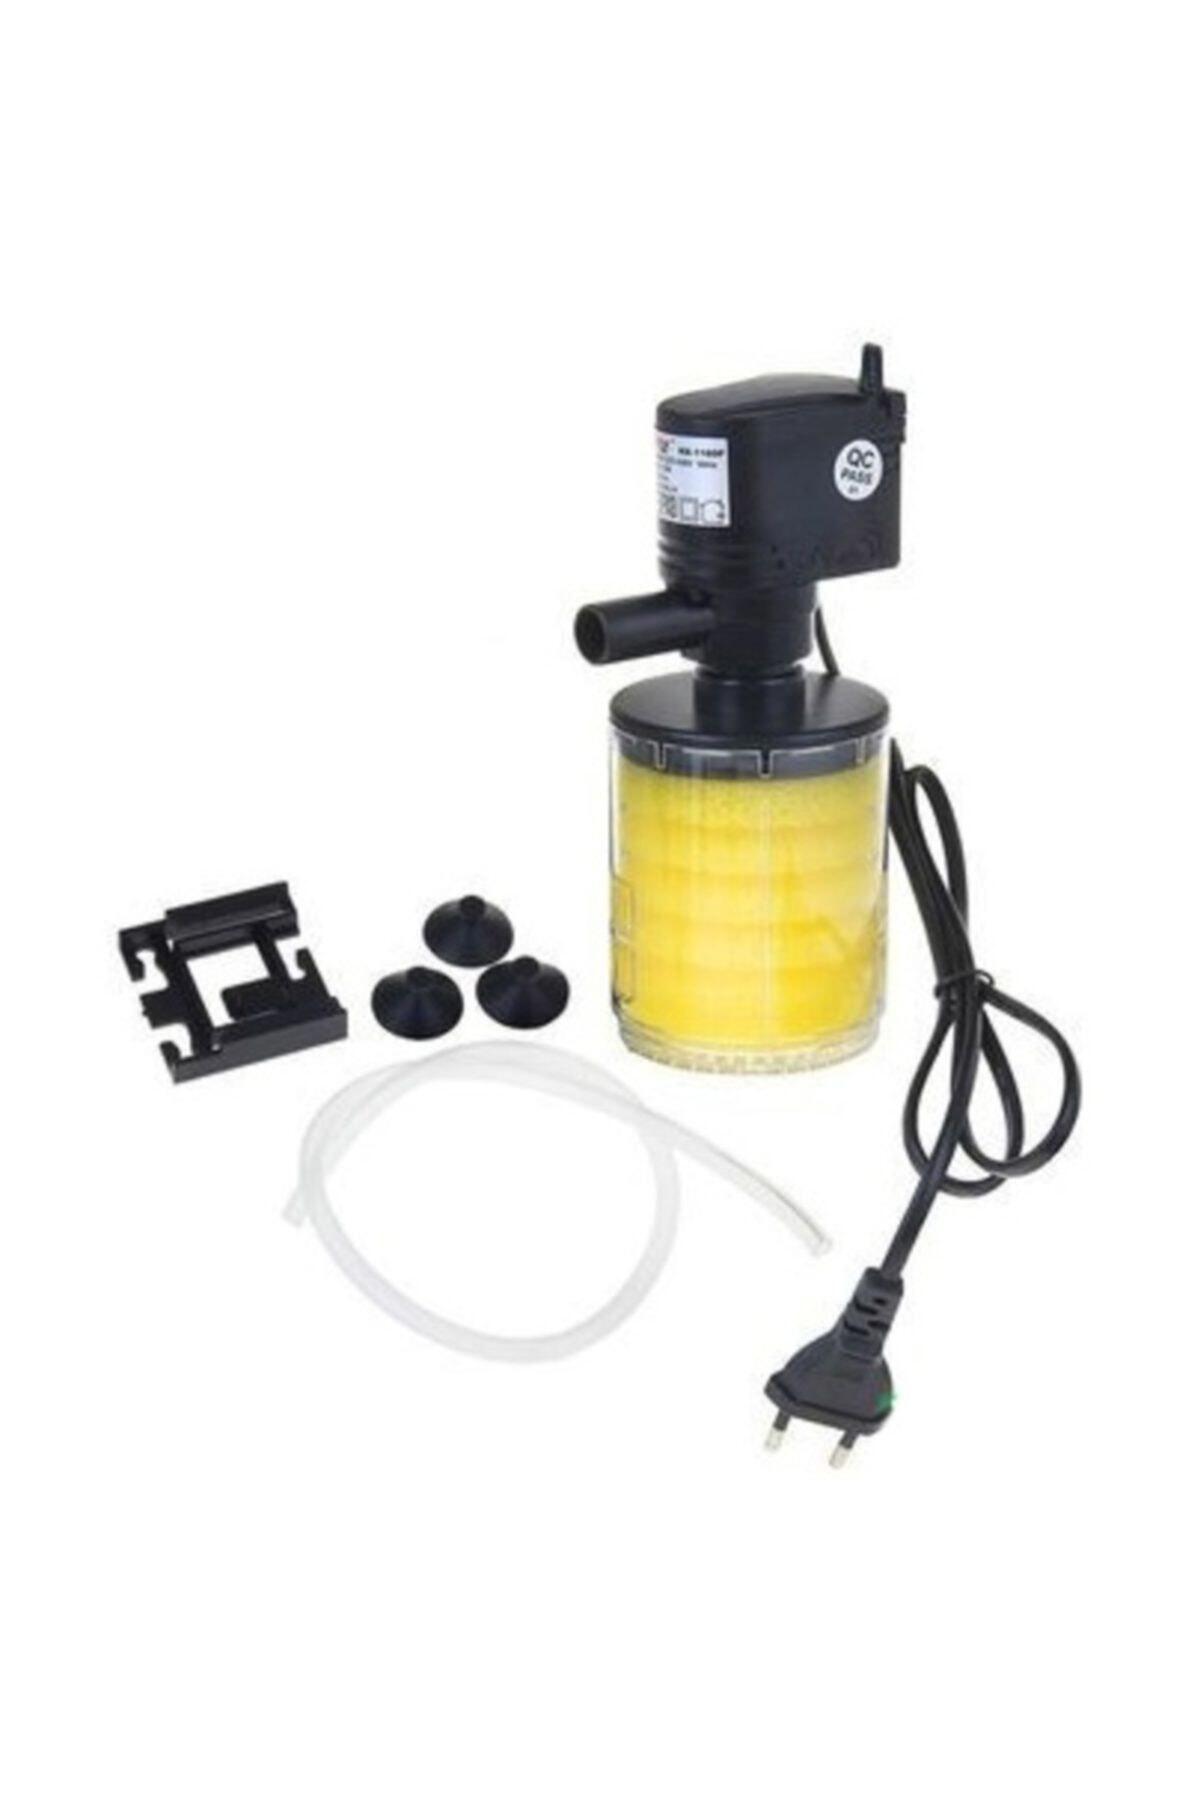 Xilong Xl-f070a Akvaryum Sarı Iç Filtre 1000 L/saat 12 W 1